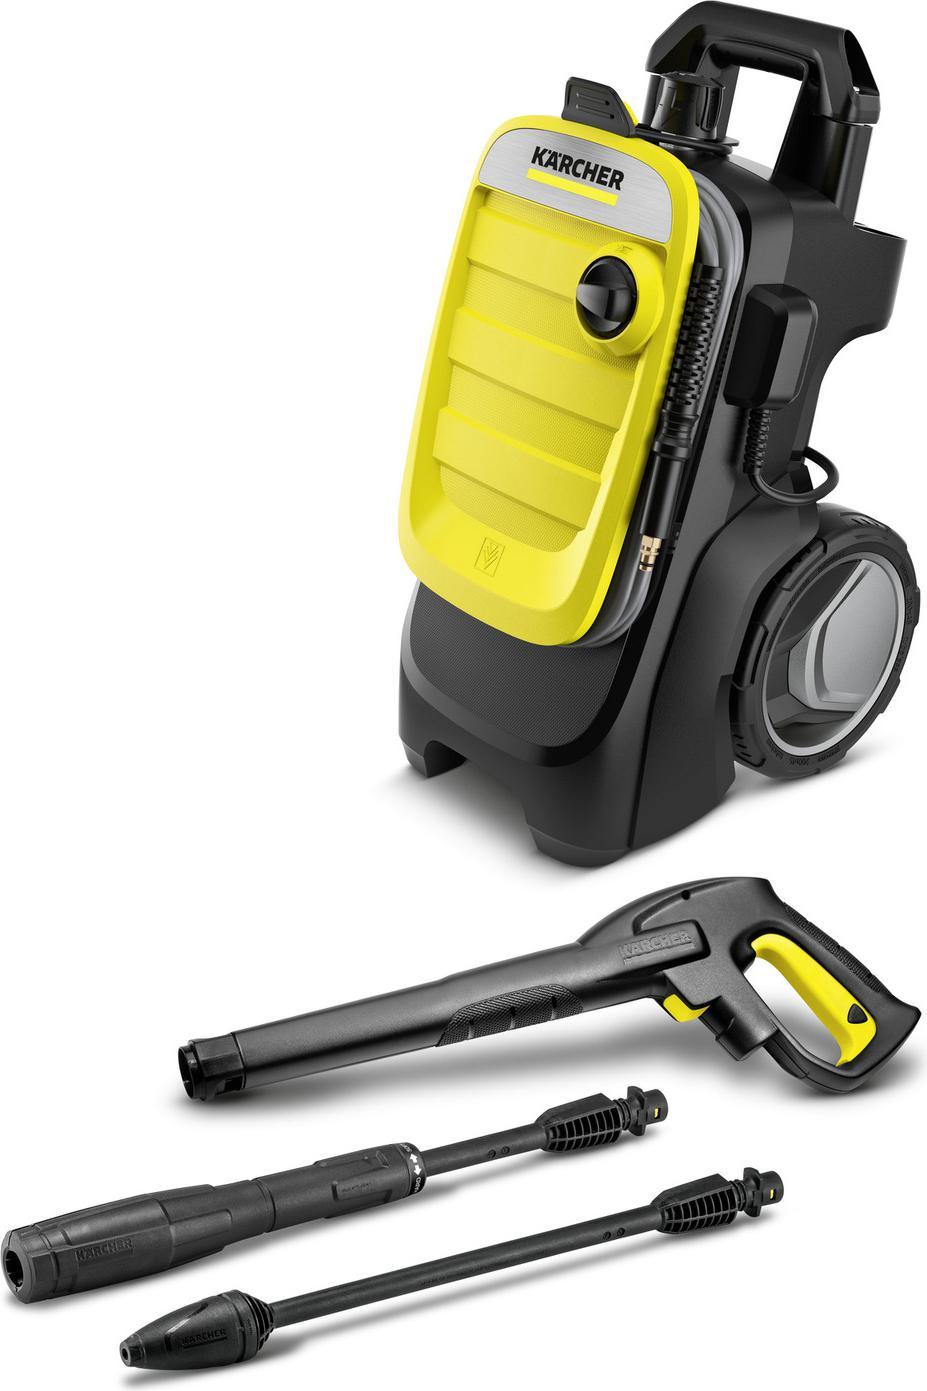 Мойка высокого давления Karcher K 7 compact *eu 1.447-050.0 karcher k 7